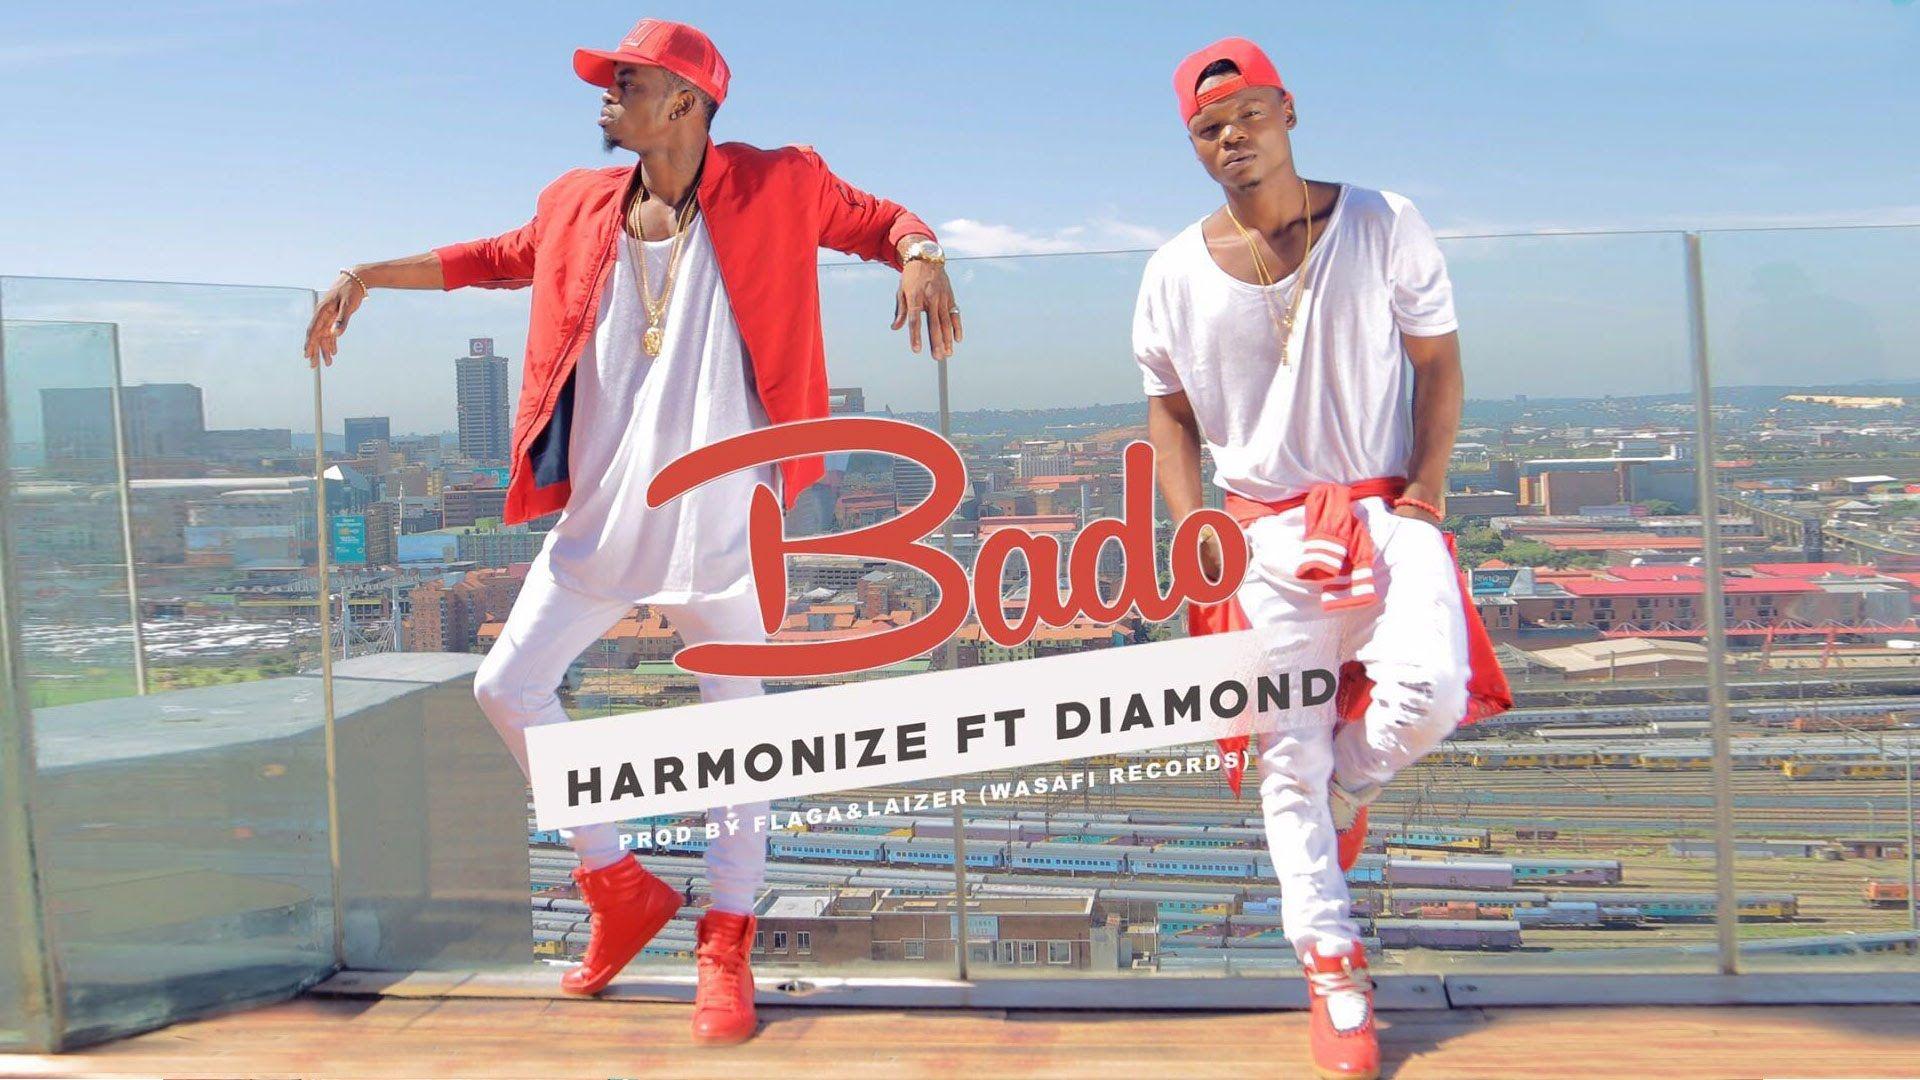 Harmonize Ft Diamond Platnumz Bado Youtube Videos Music Video